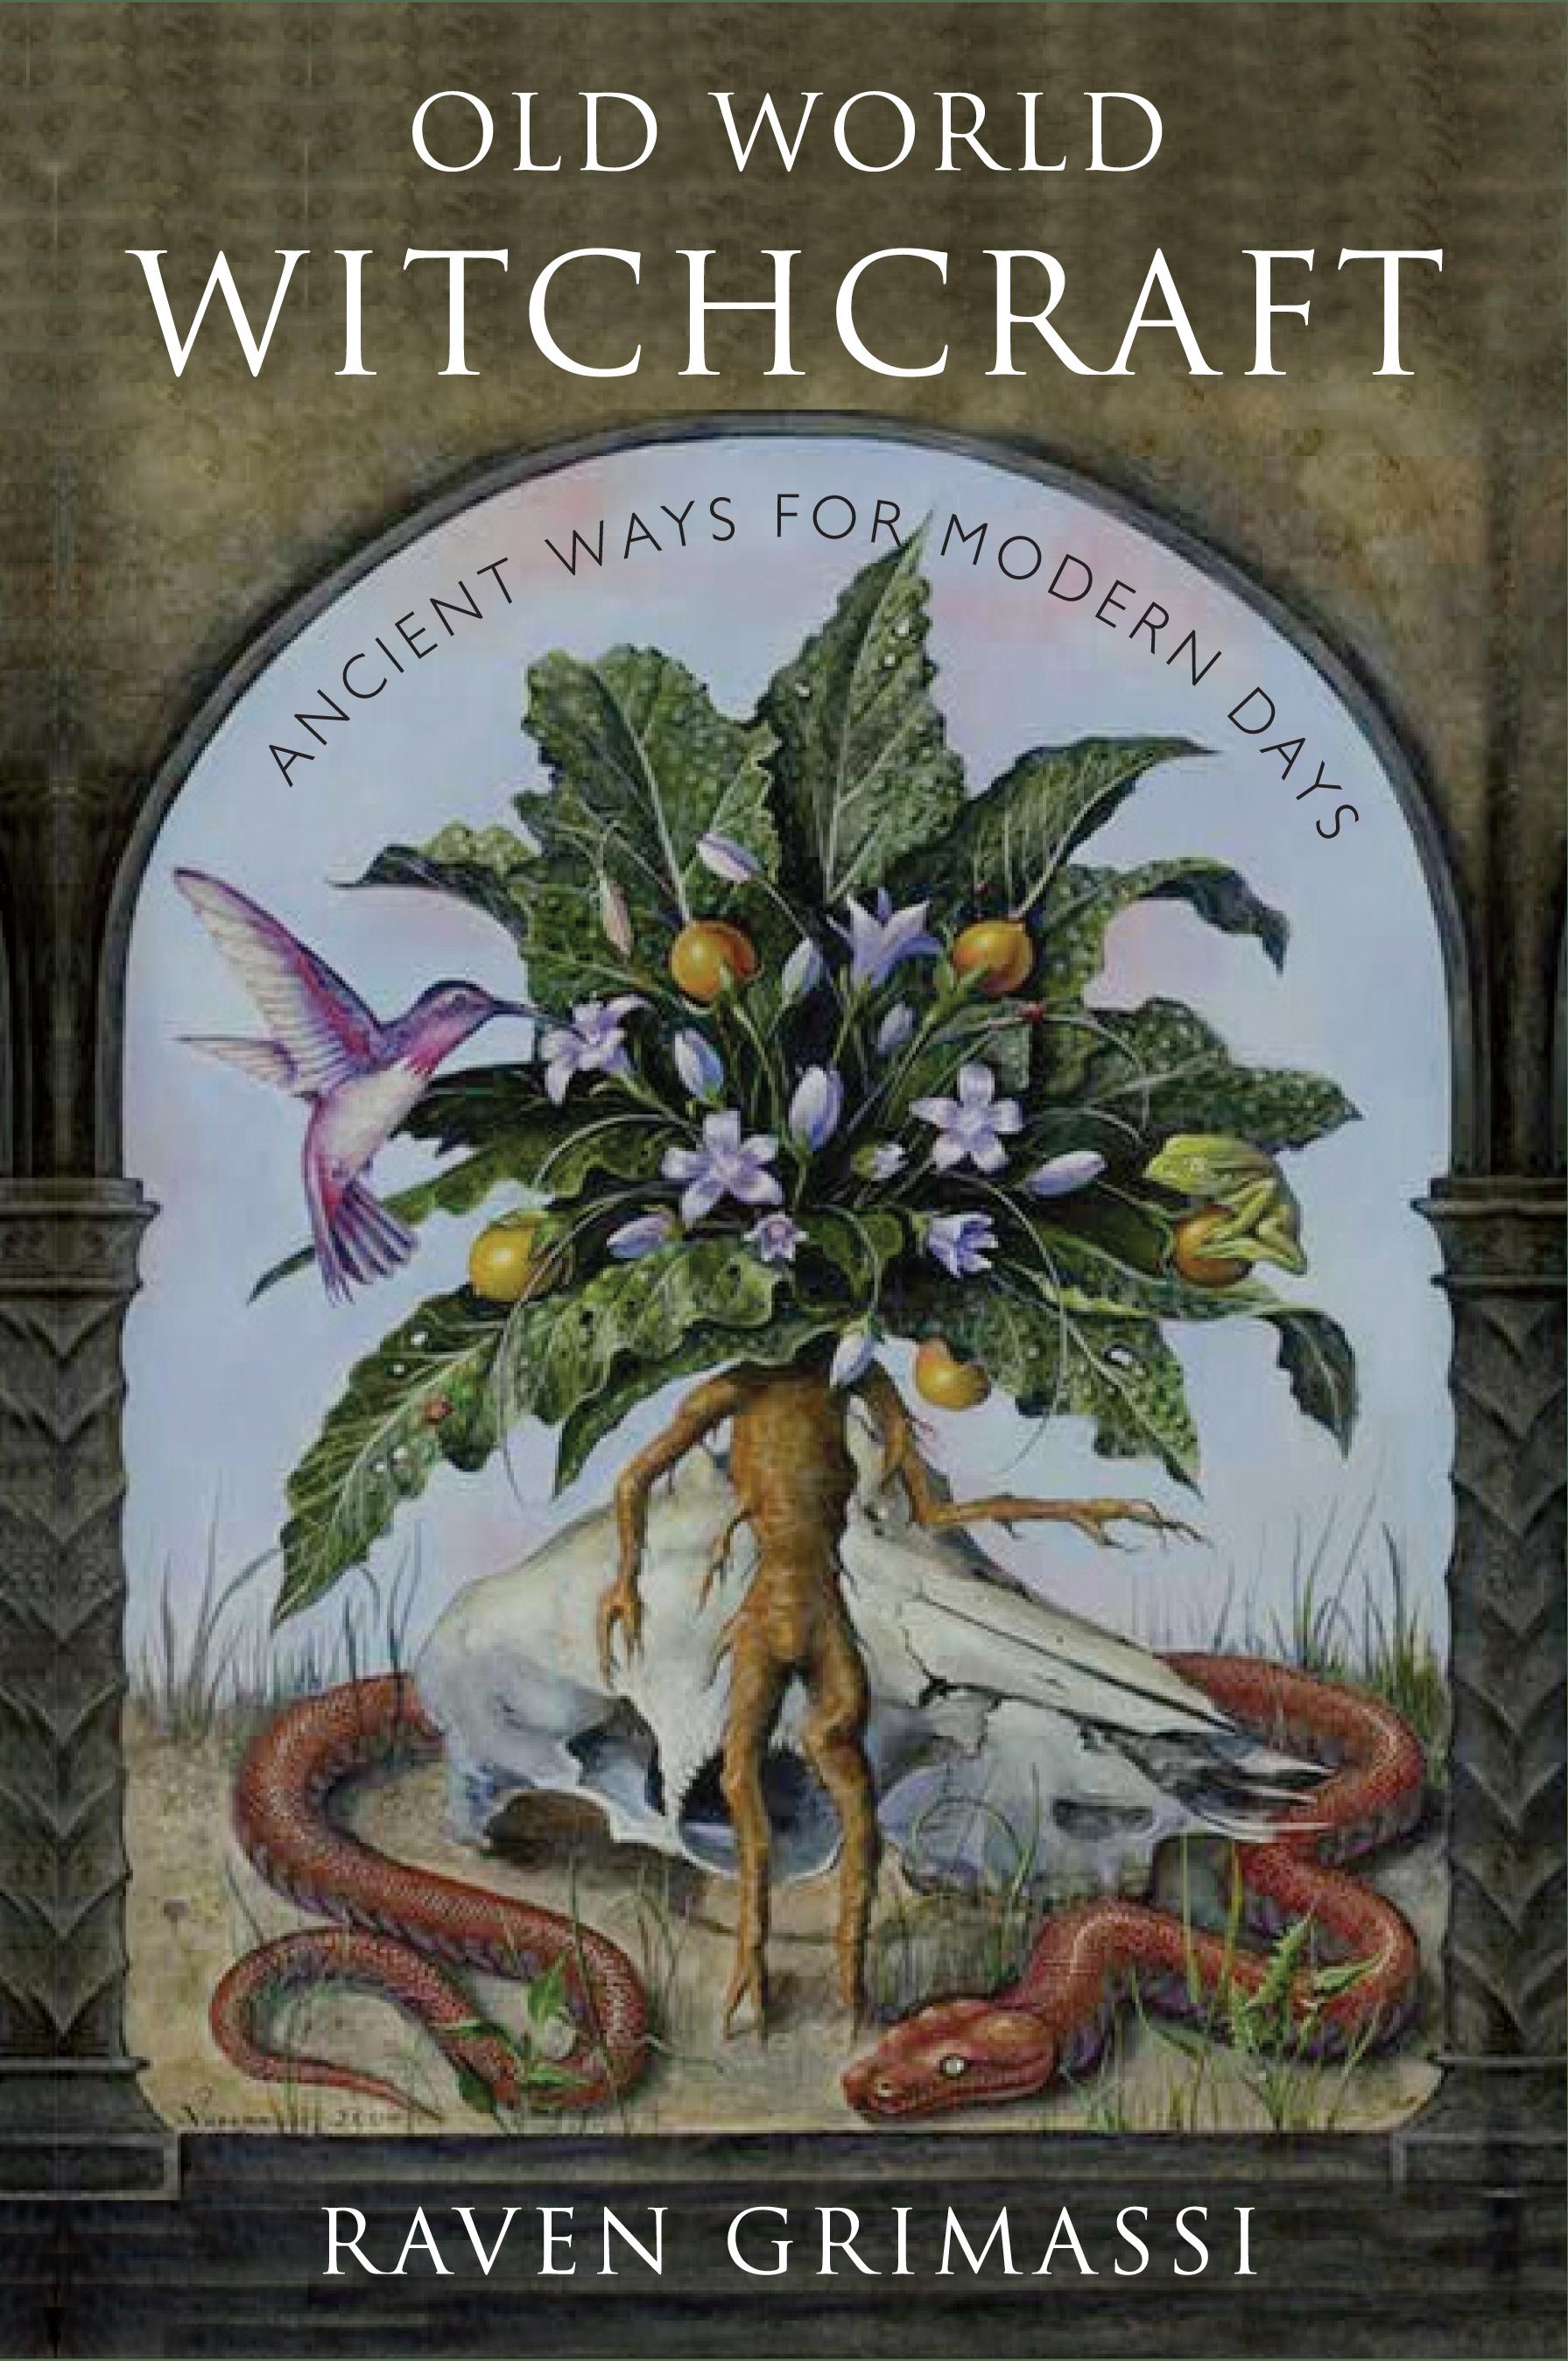 Old World Witchcraft- Ancient Ways for Modern Days